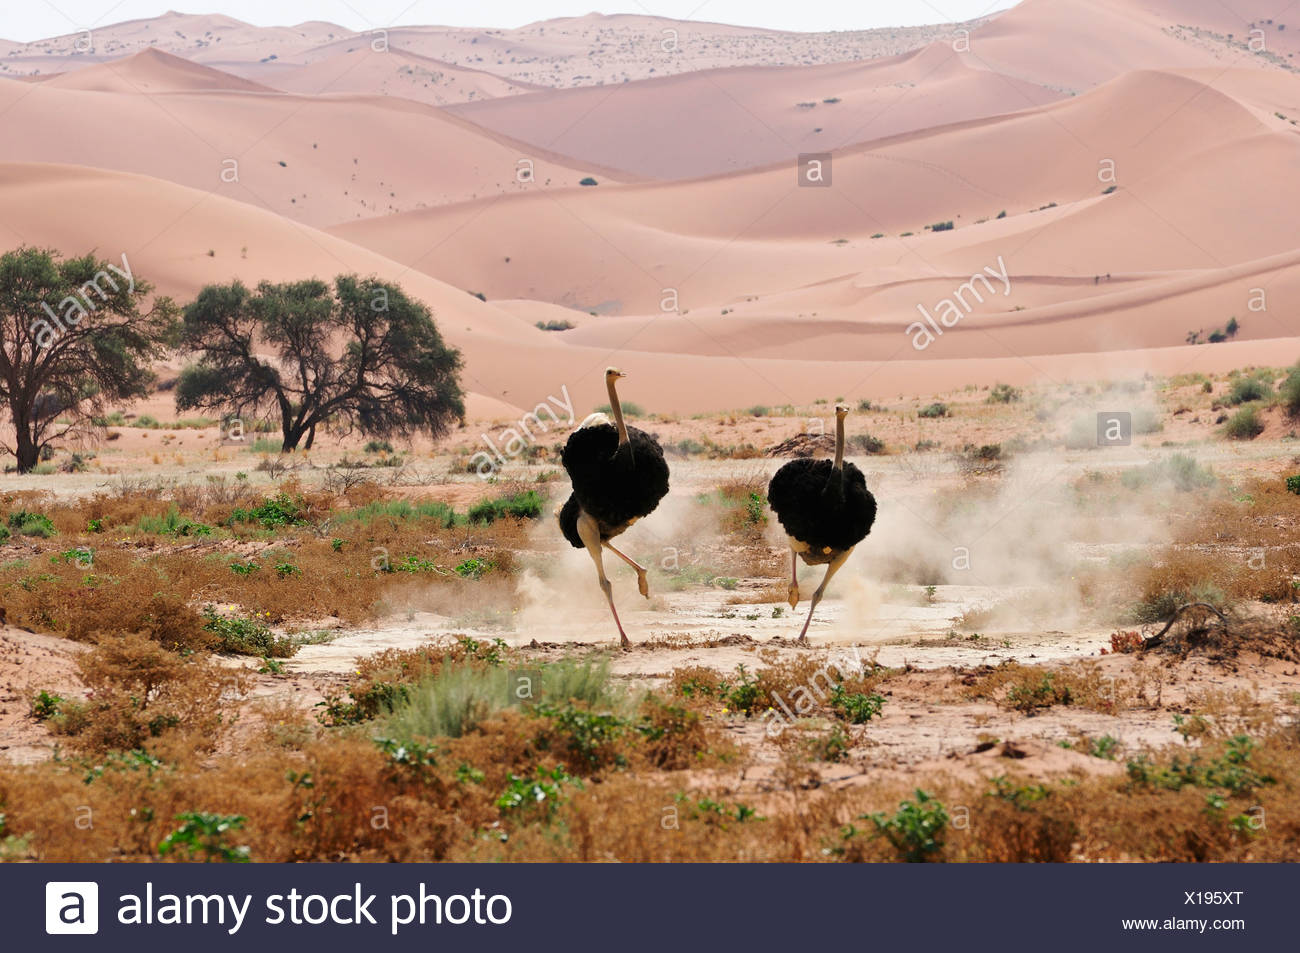 Africa Dunes Hills Namib Naukluft Park Namibia Sossusvlei afraid african charging horizontal ostrich bird running Stock Photo